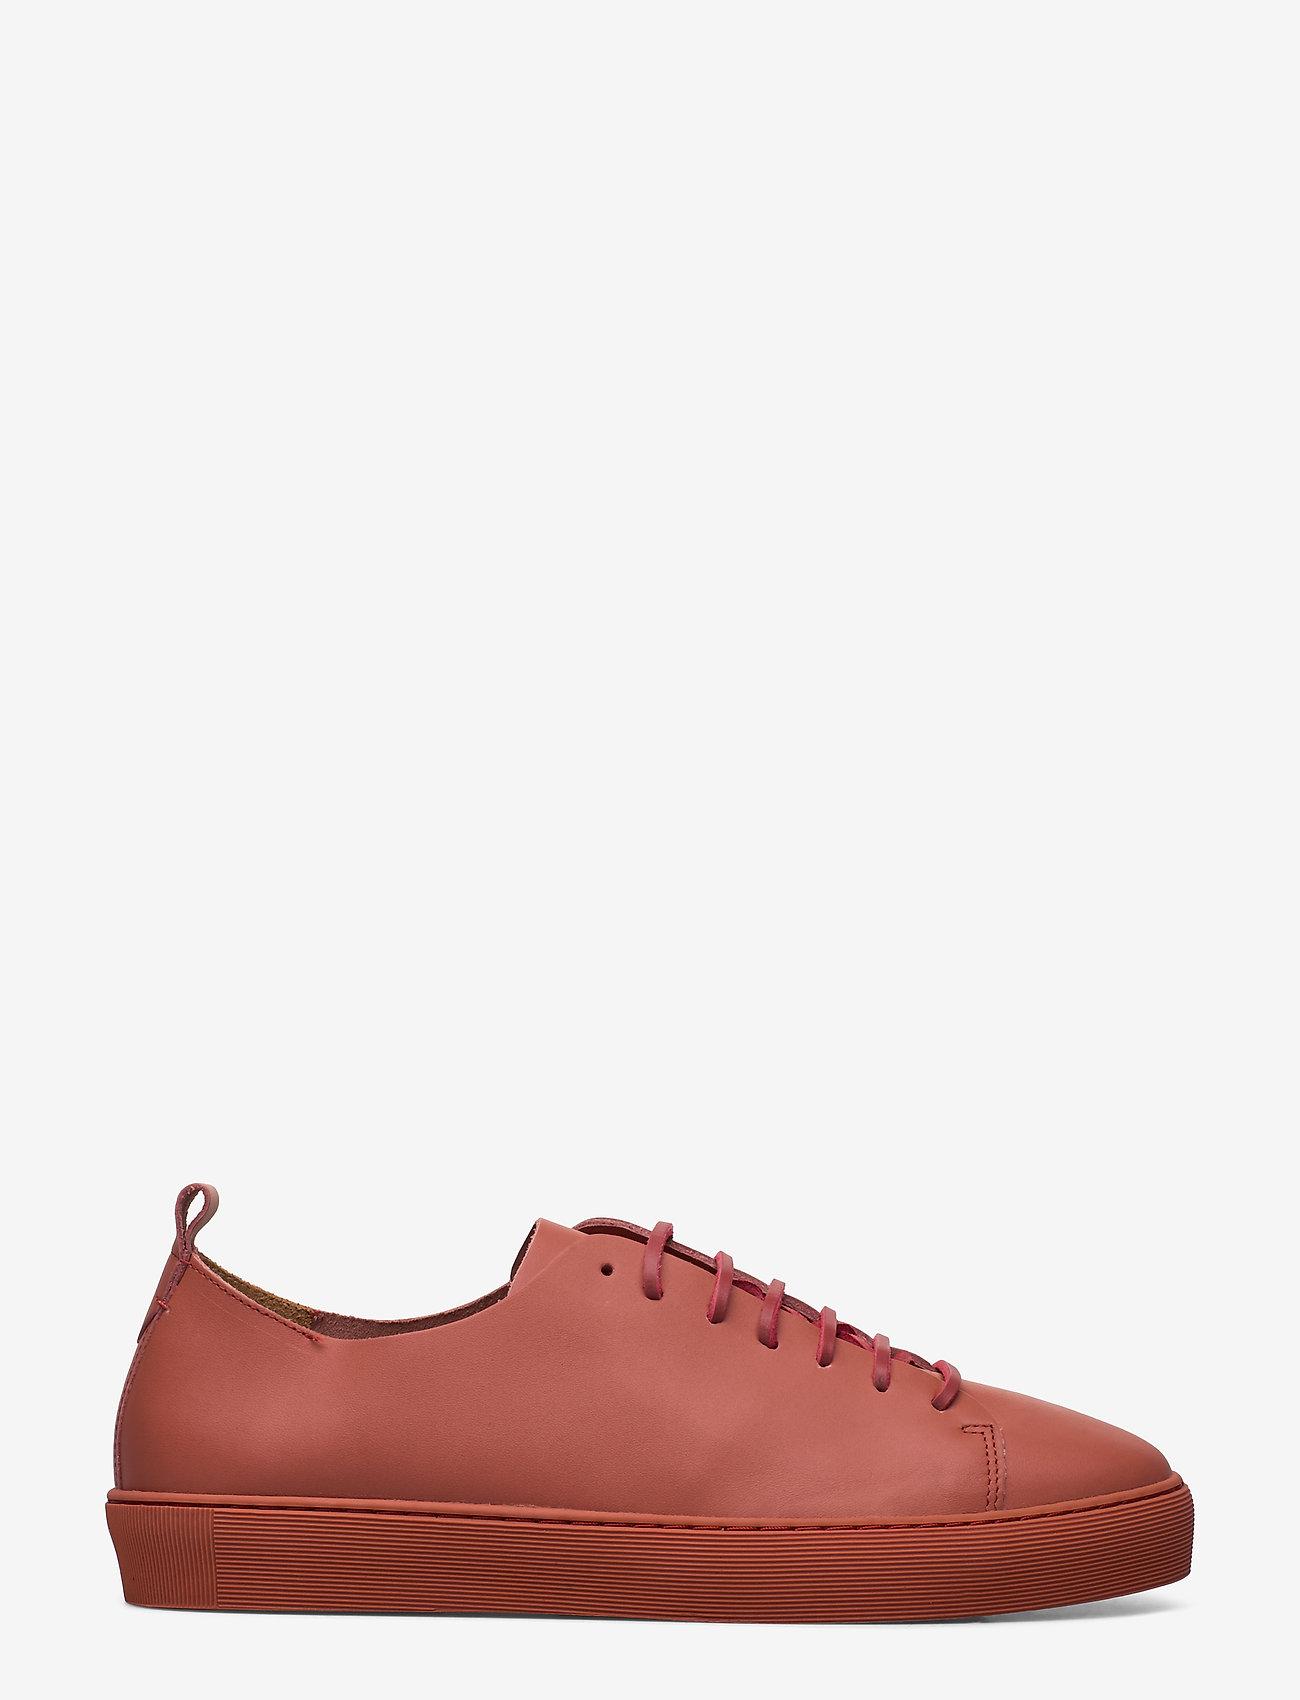 Royal RepubliQ Doric Derby Shoe - Sneakers NUDE - Schuhe Billige